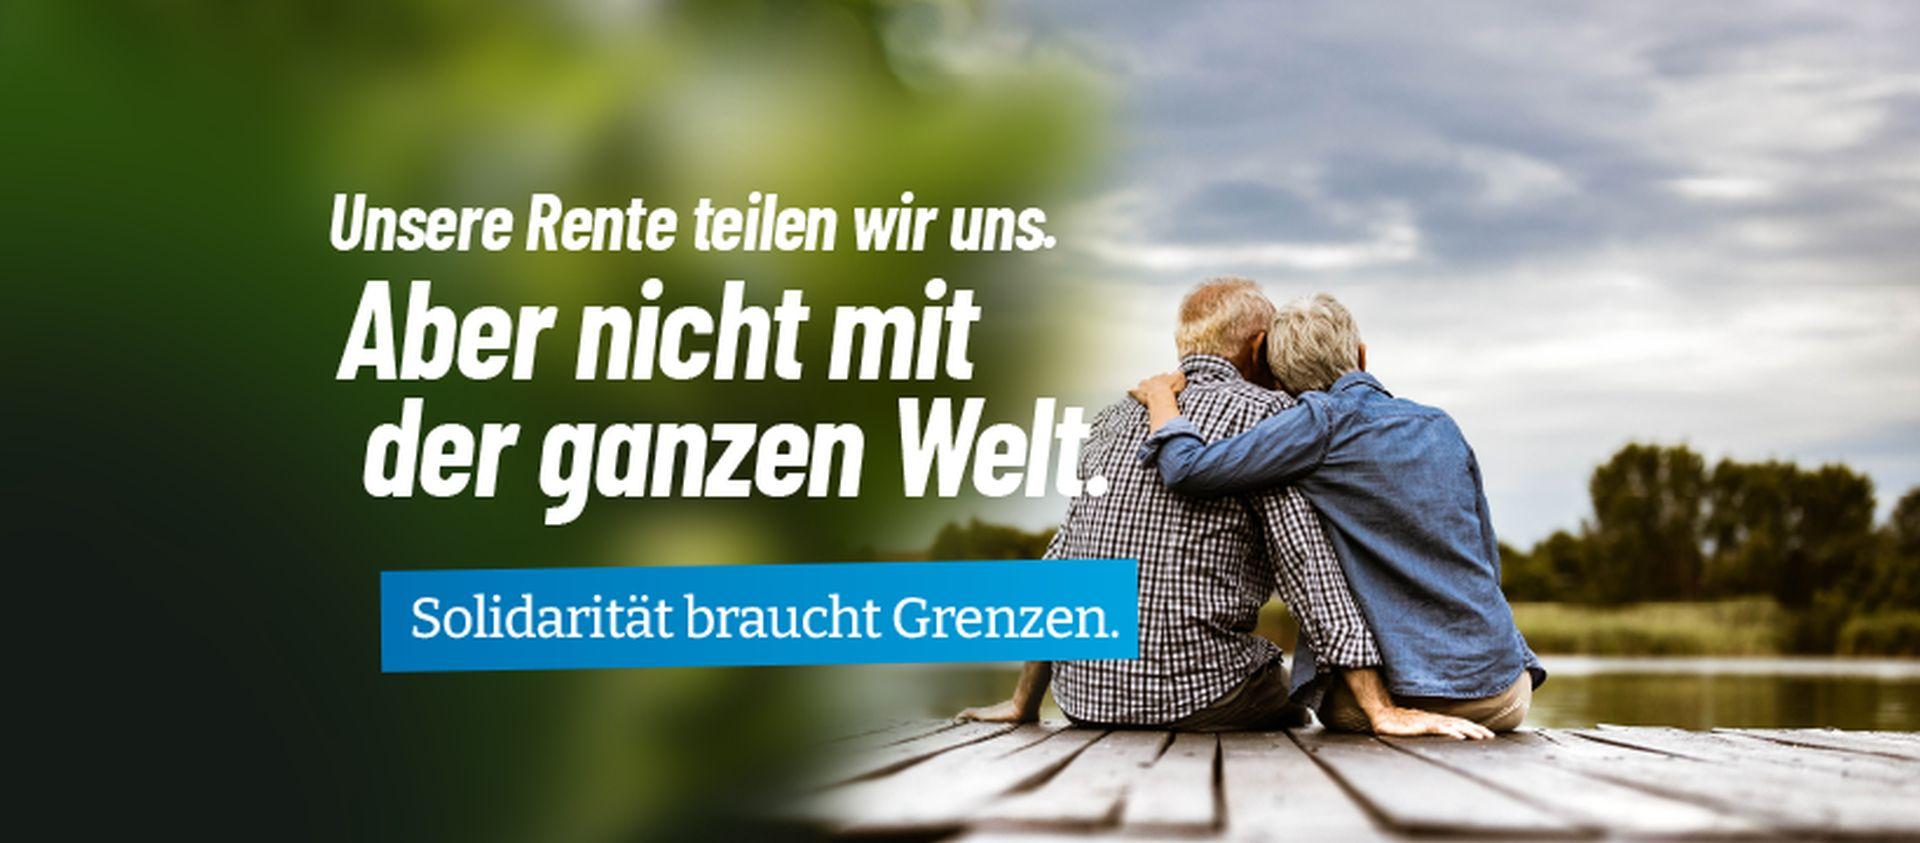 FB_Cover_Photo_Kampagne2_Rente_1